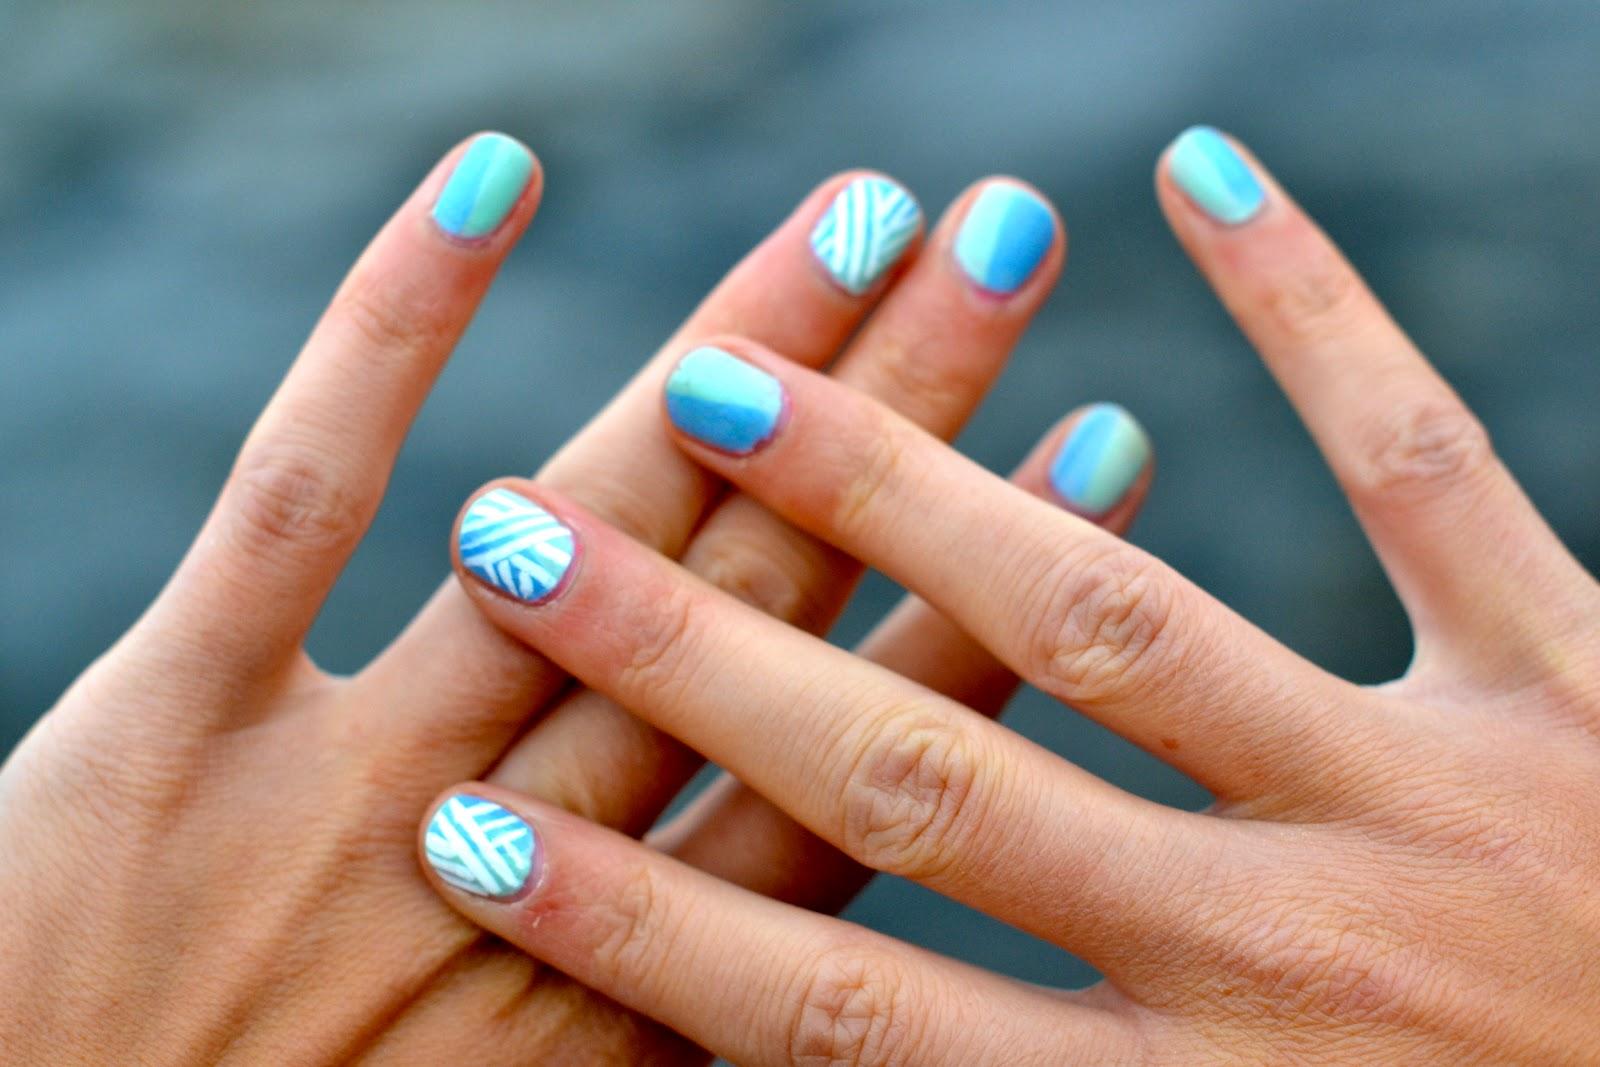 Blue Nail Designs For Short Nails Hd Wallpapers